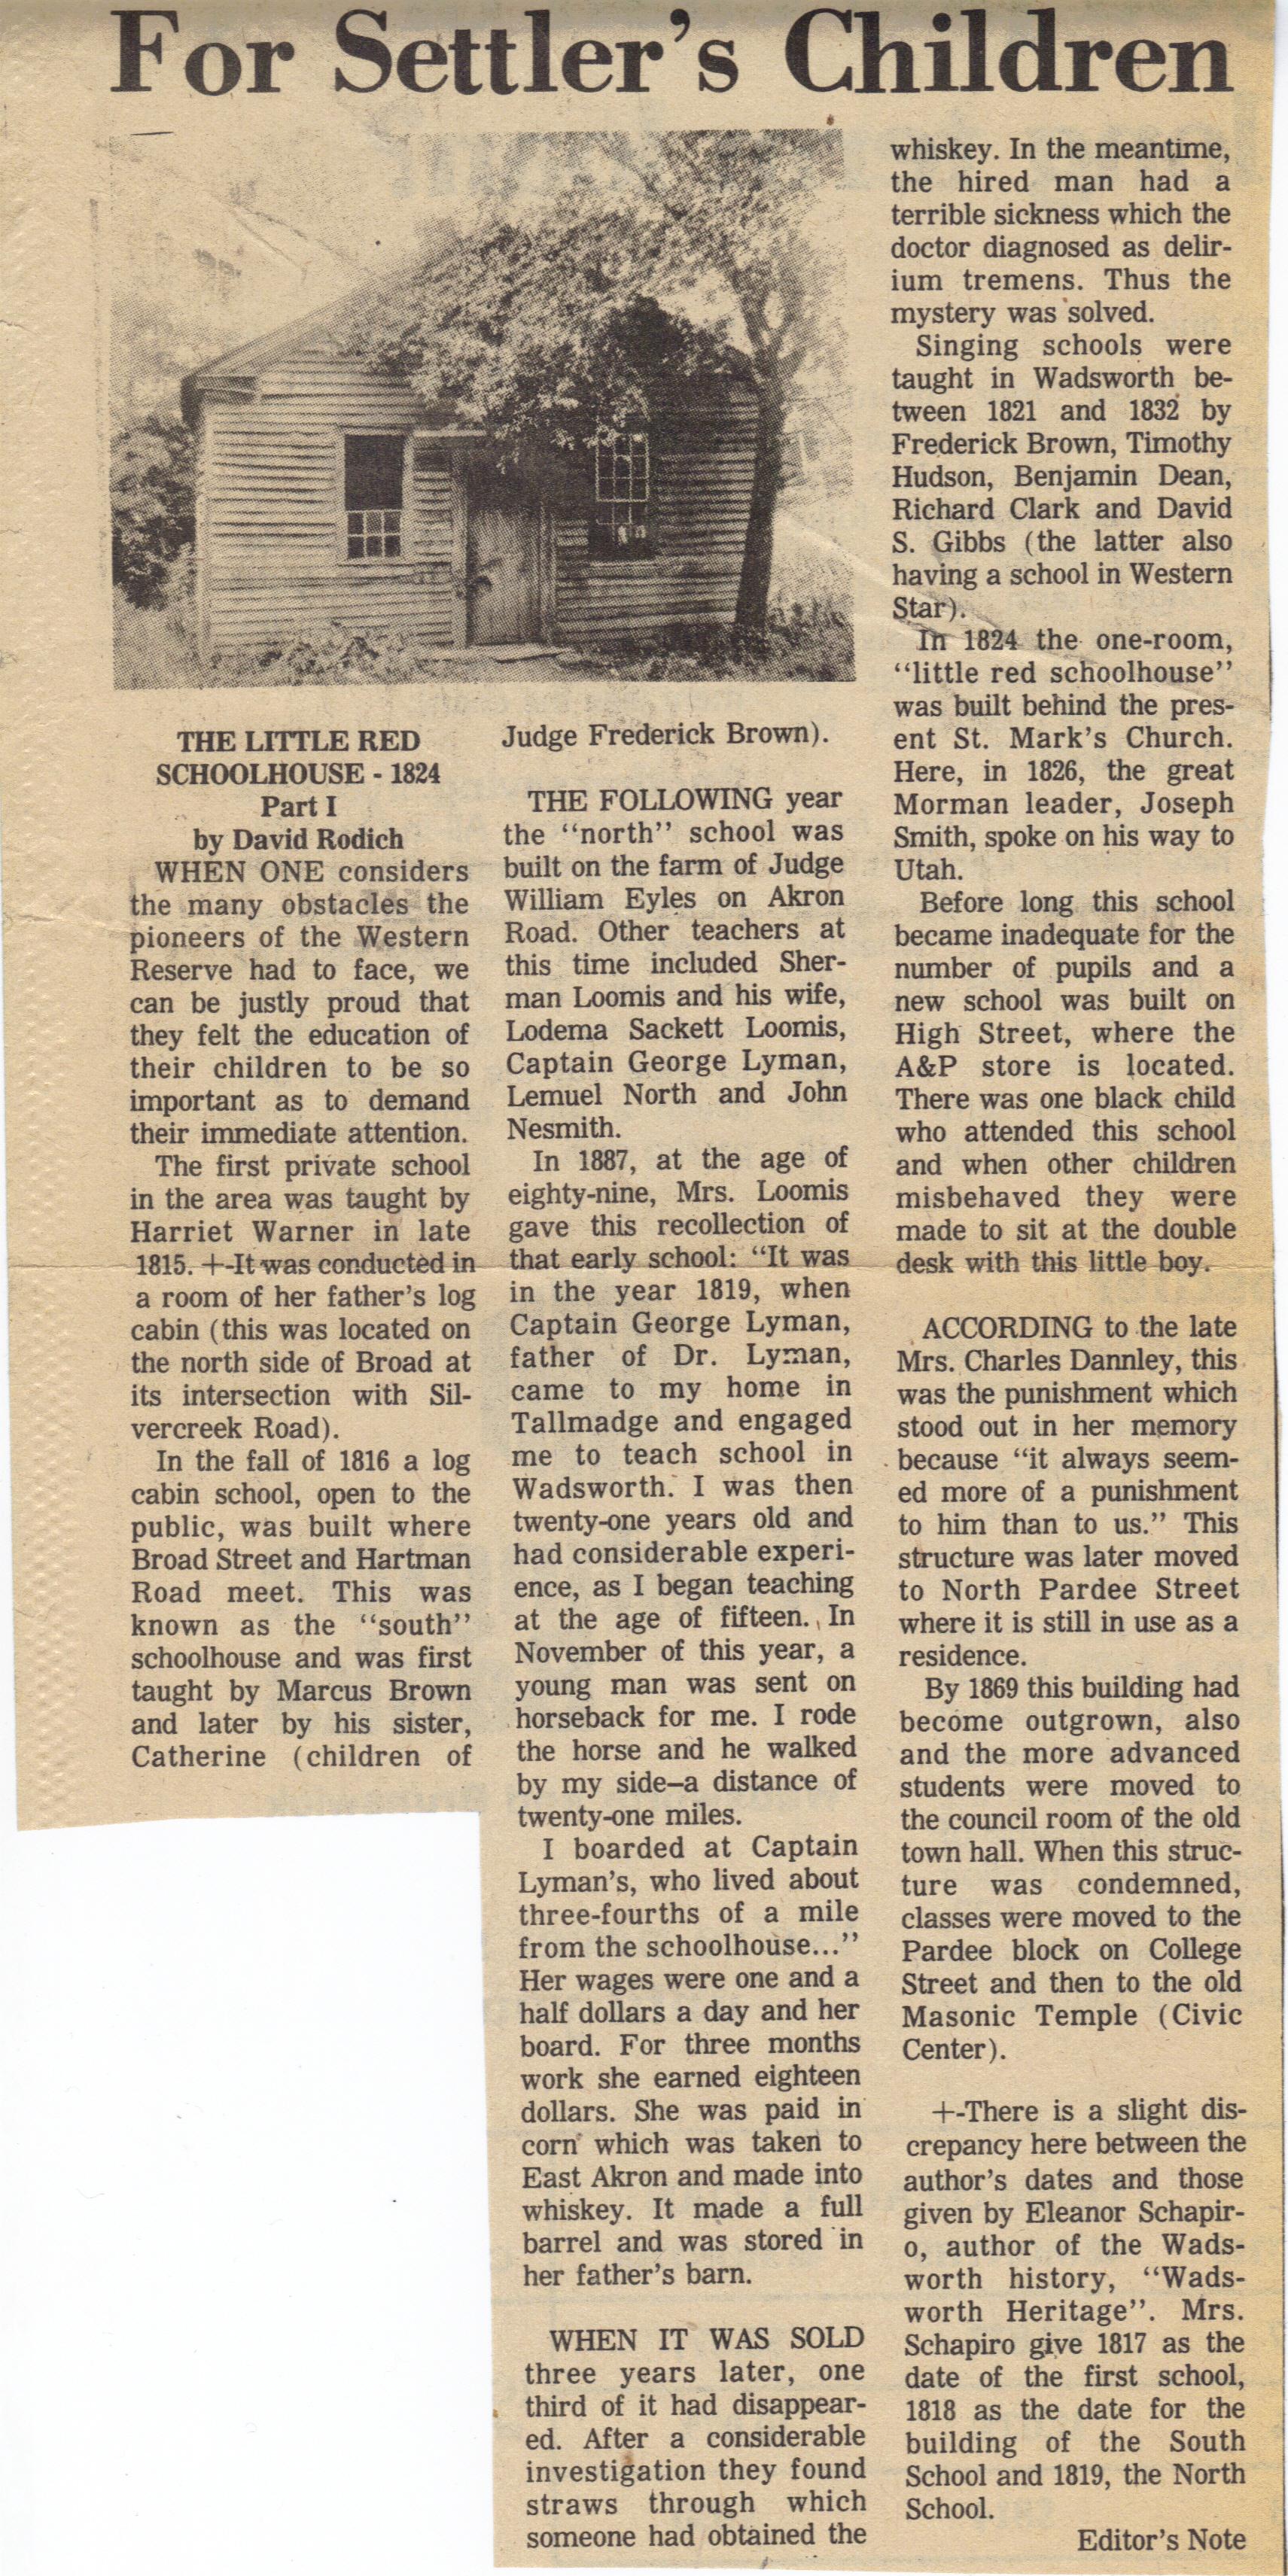 Figure 3: Original Newspaper Story